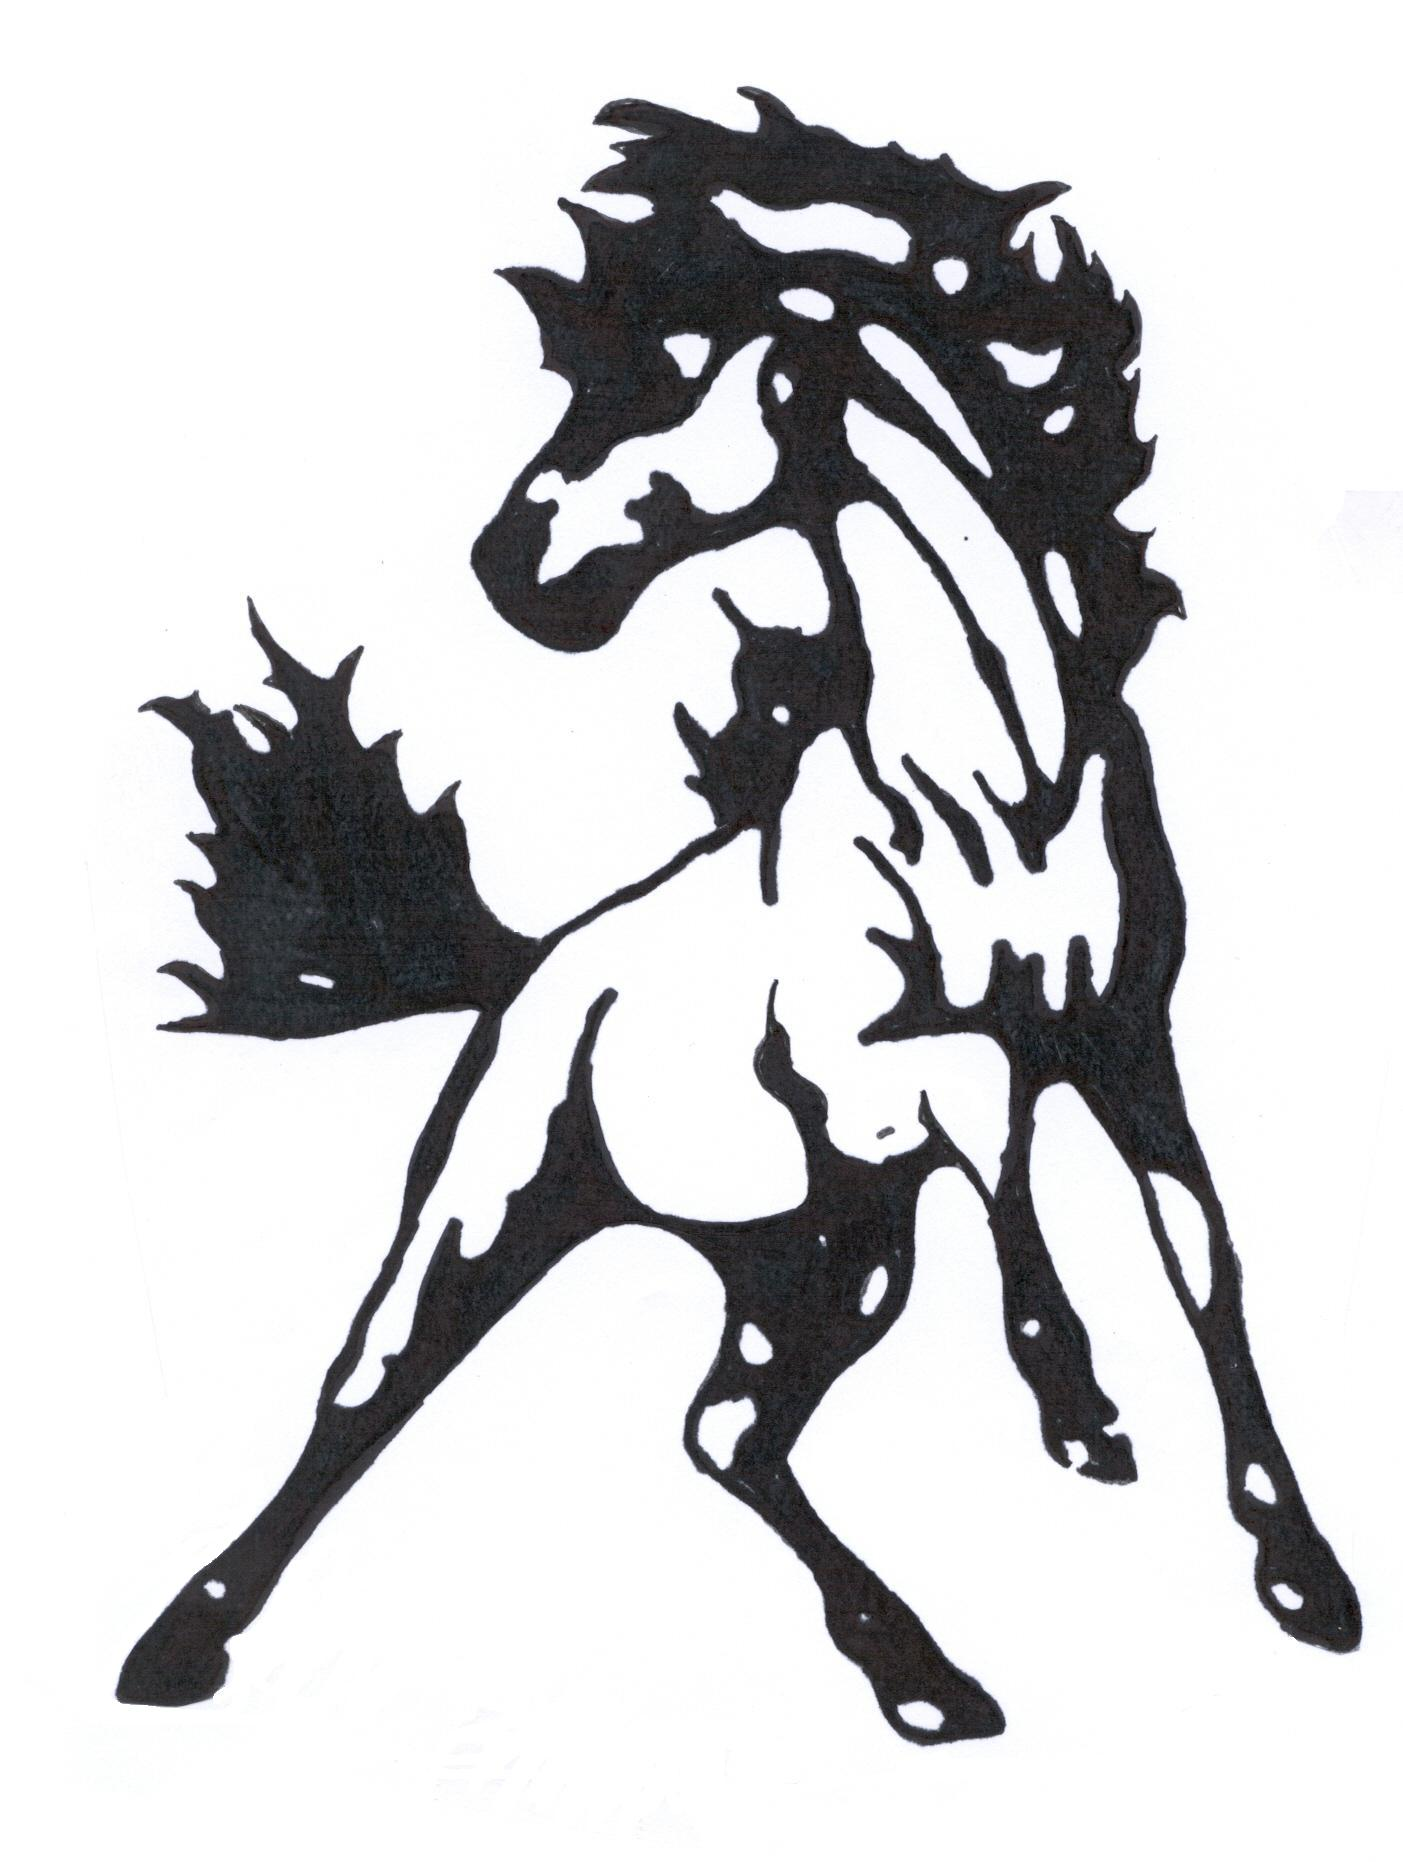 Drawn sykol mustang Mascot Mustang photo#18 Clipart clipart